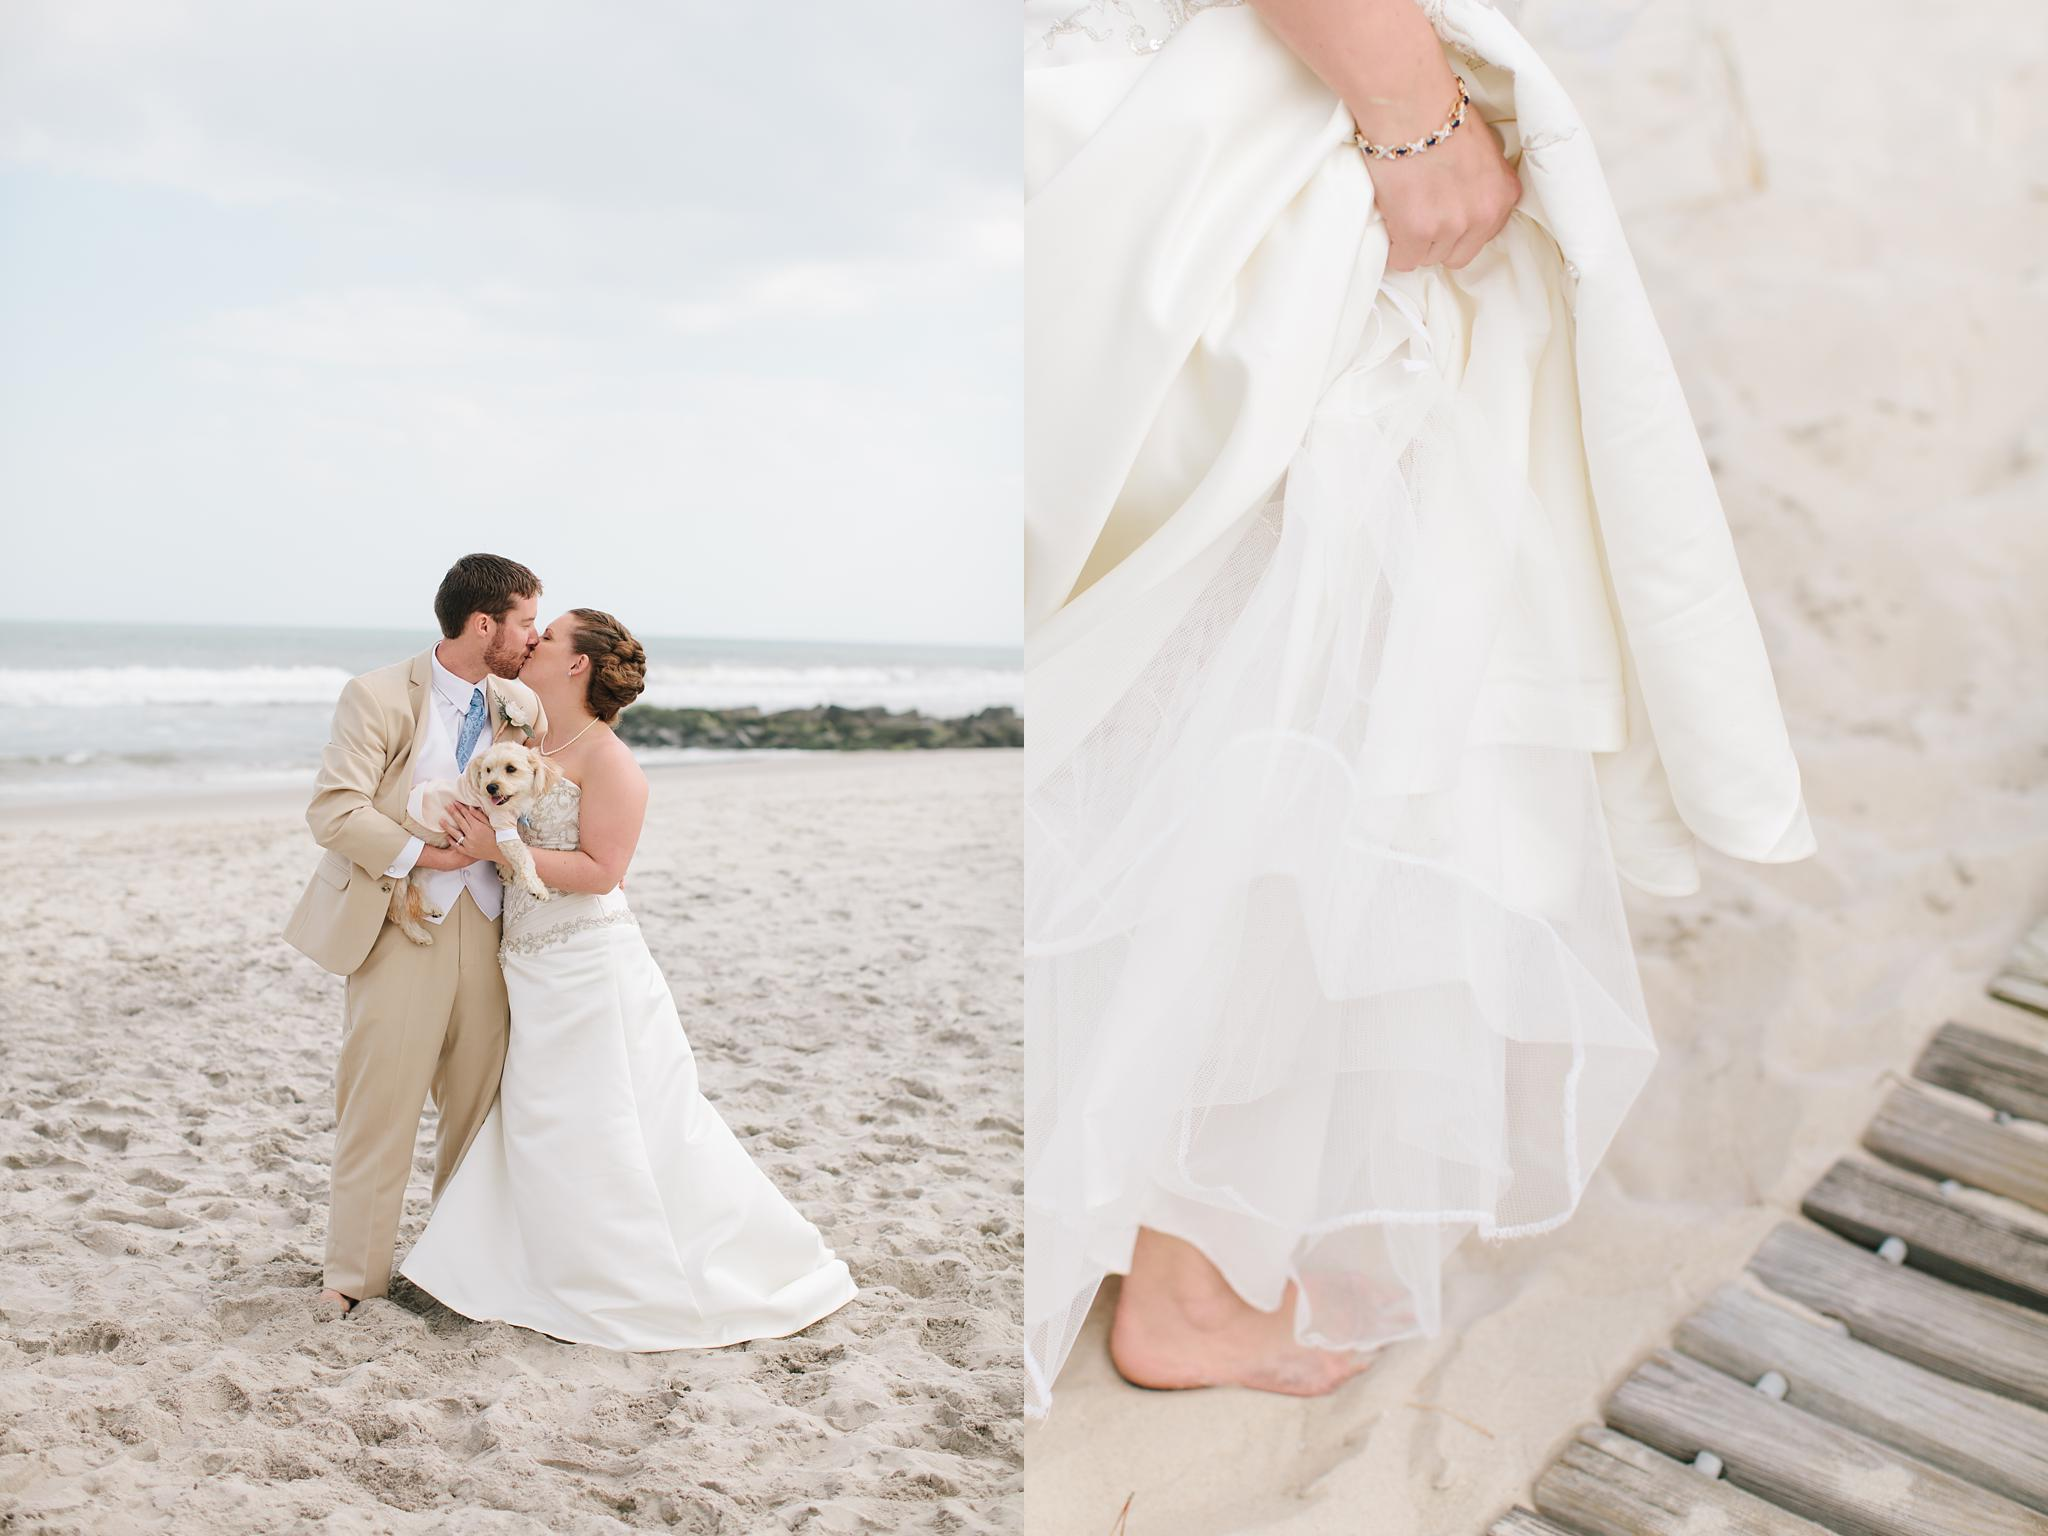 brant_beach_yacht_club_wedding_long_beach_island_nj_wedding_photographer_580.jpg